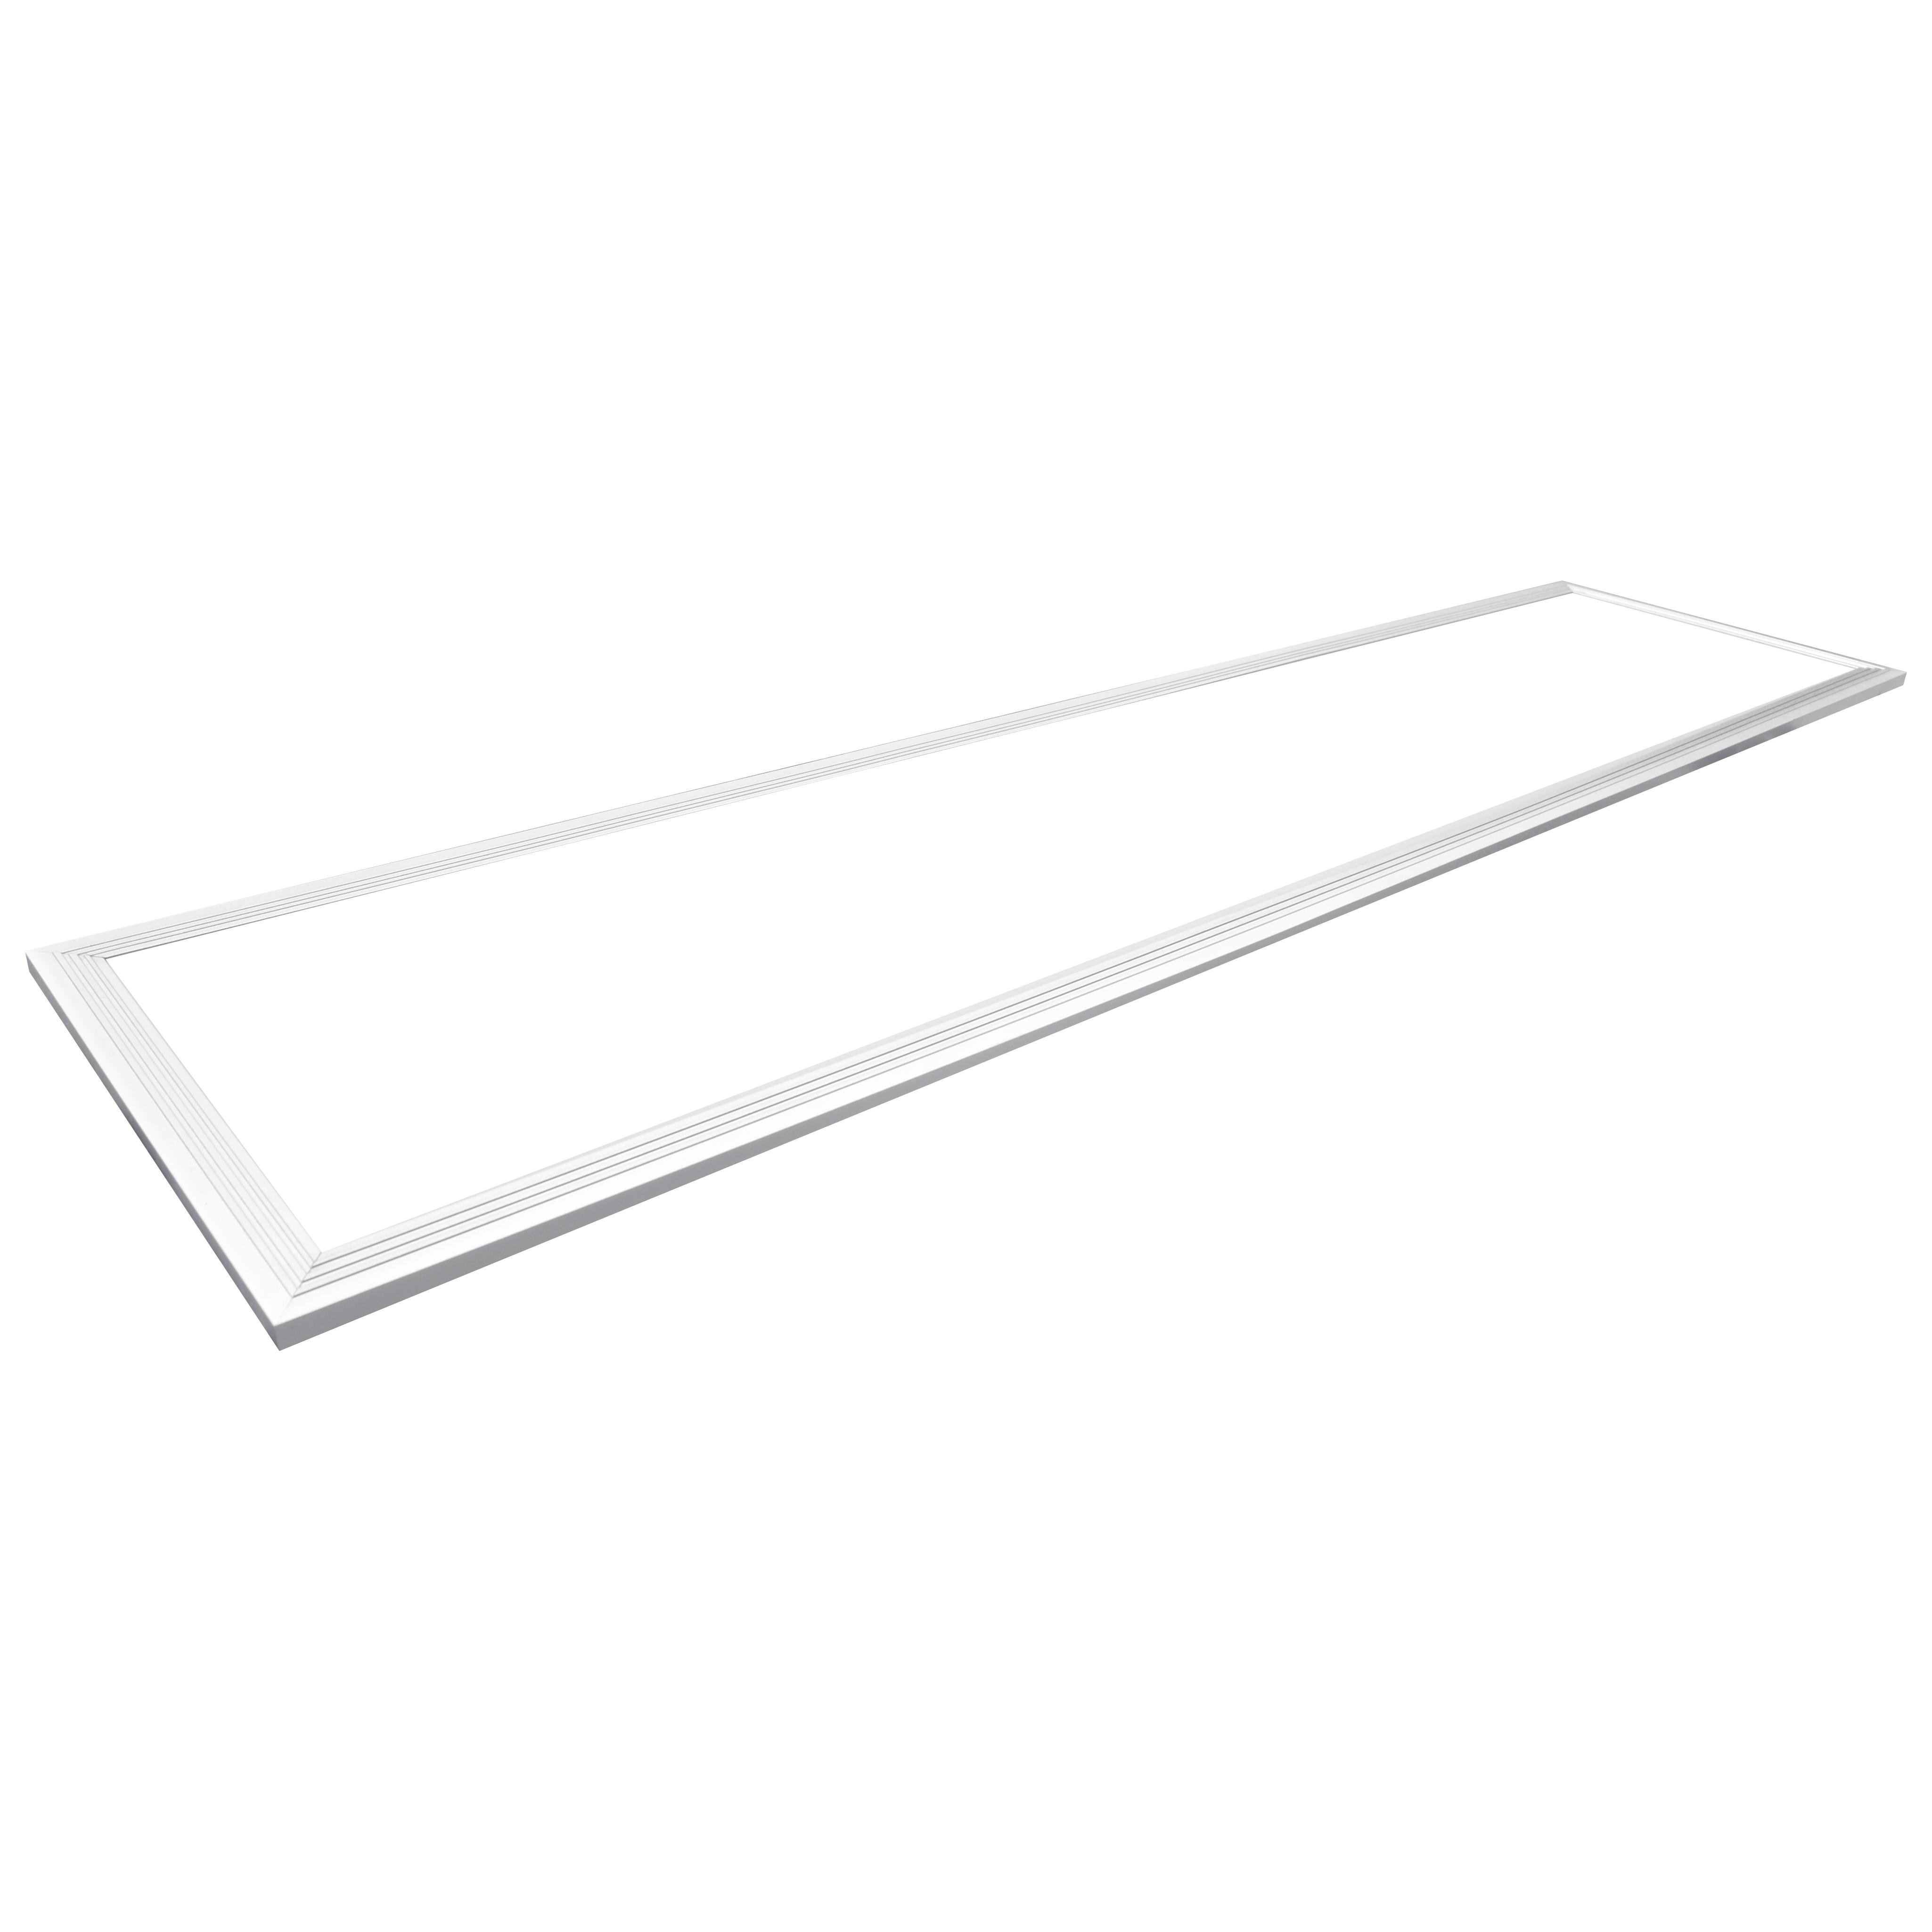 LED panel VIRGO II 40W NW/840 GREENLUX (GXLS099)